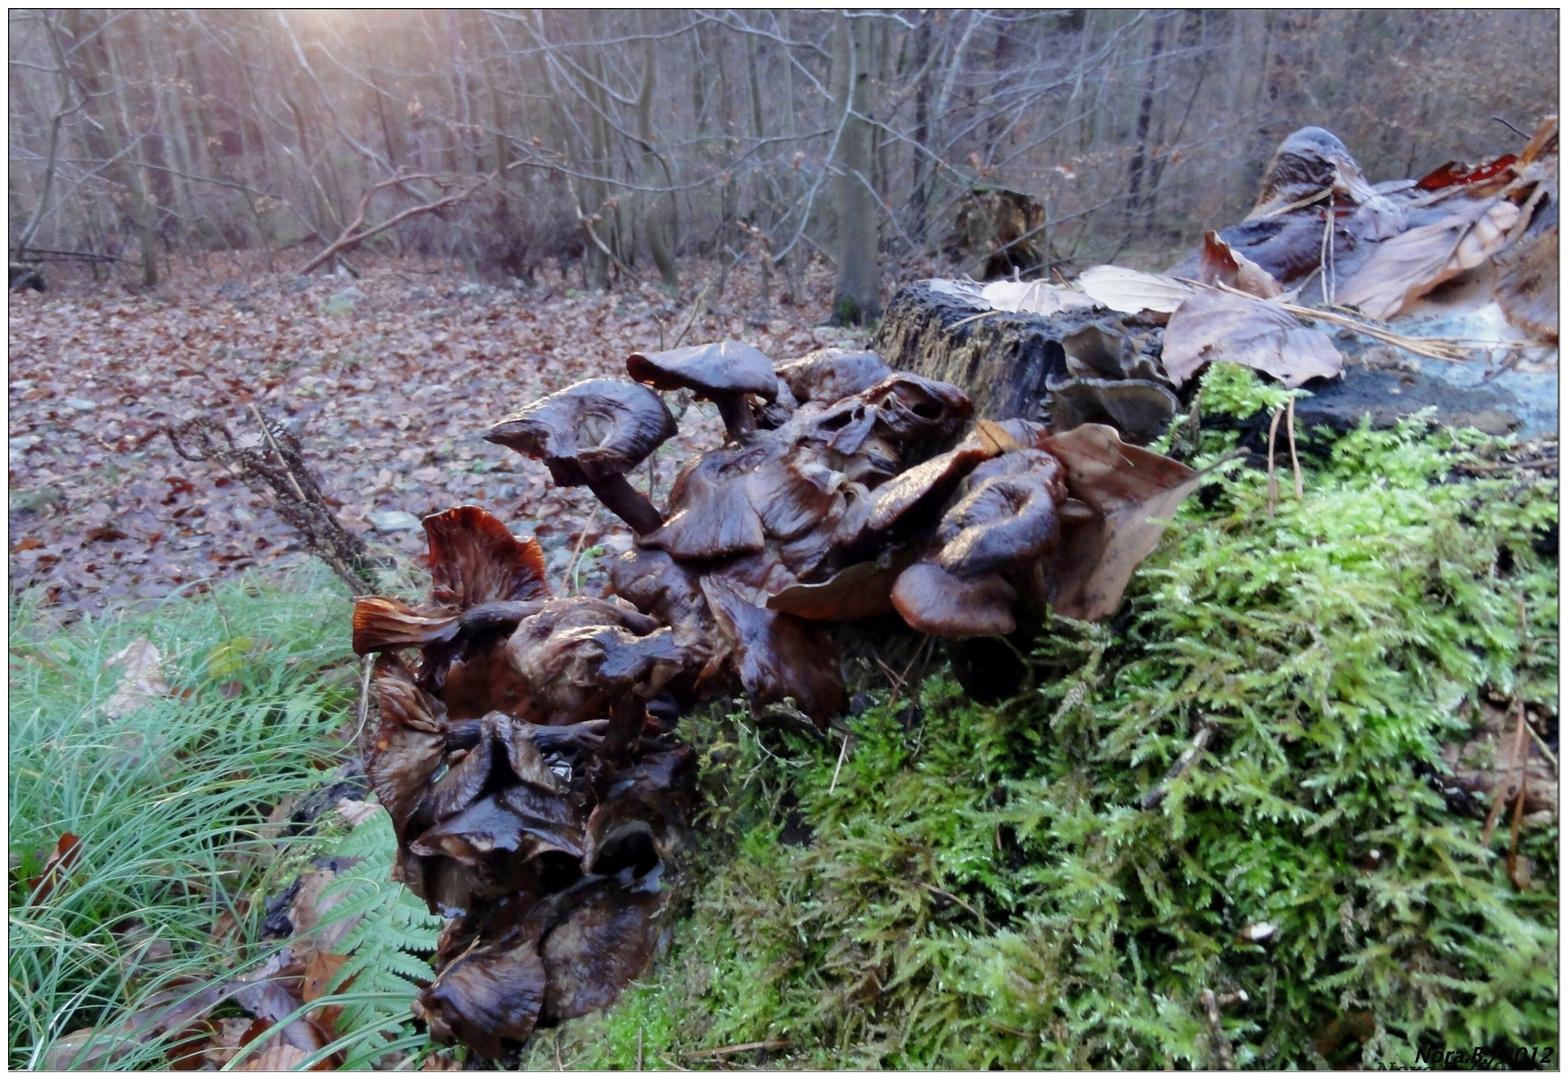 Baumpilze und Flechten im Winter